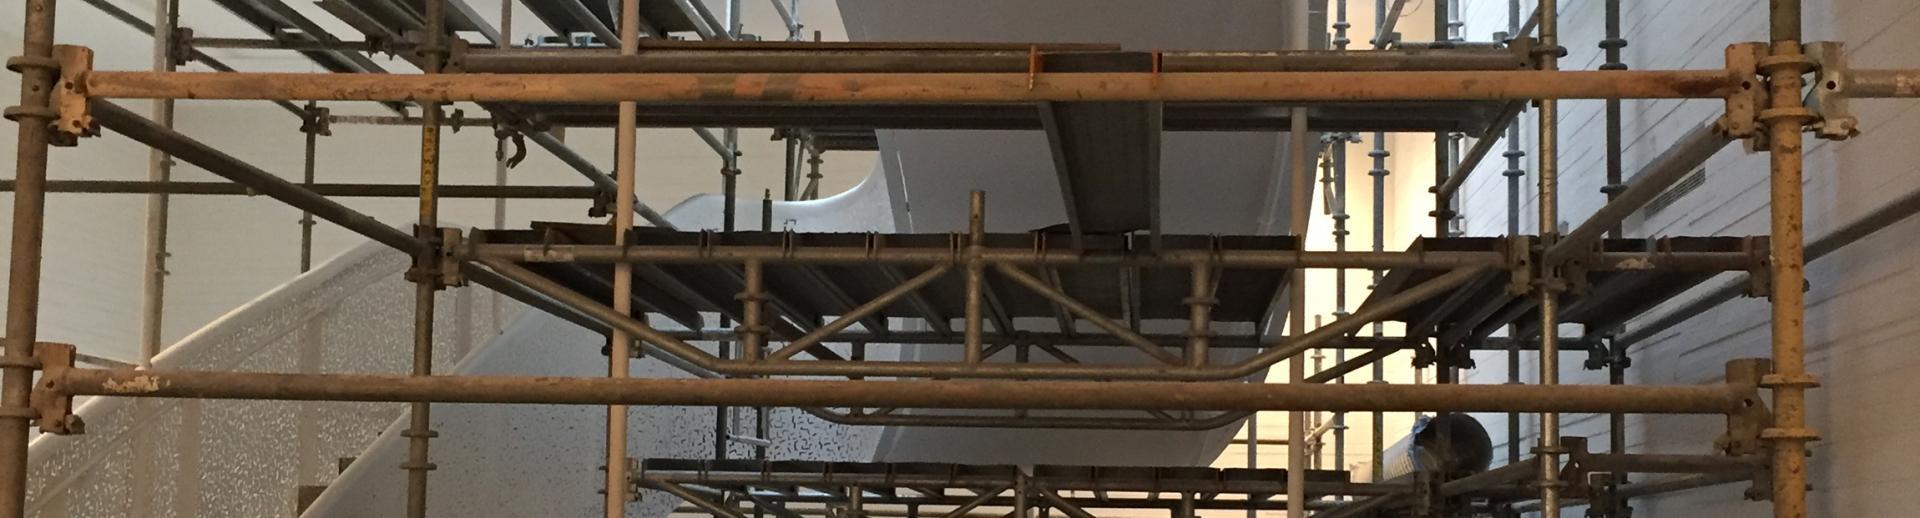 Construction scaffolding equipment